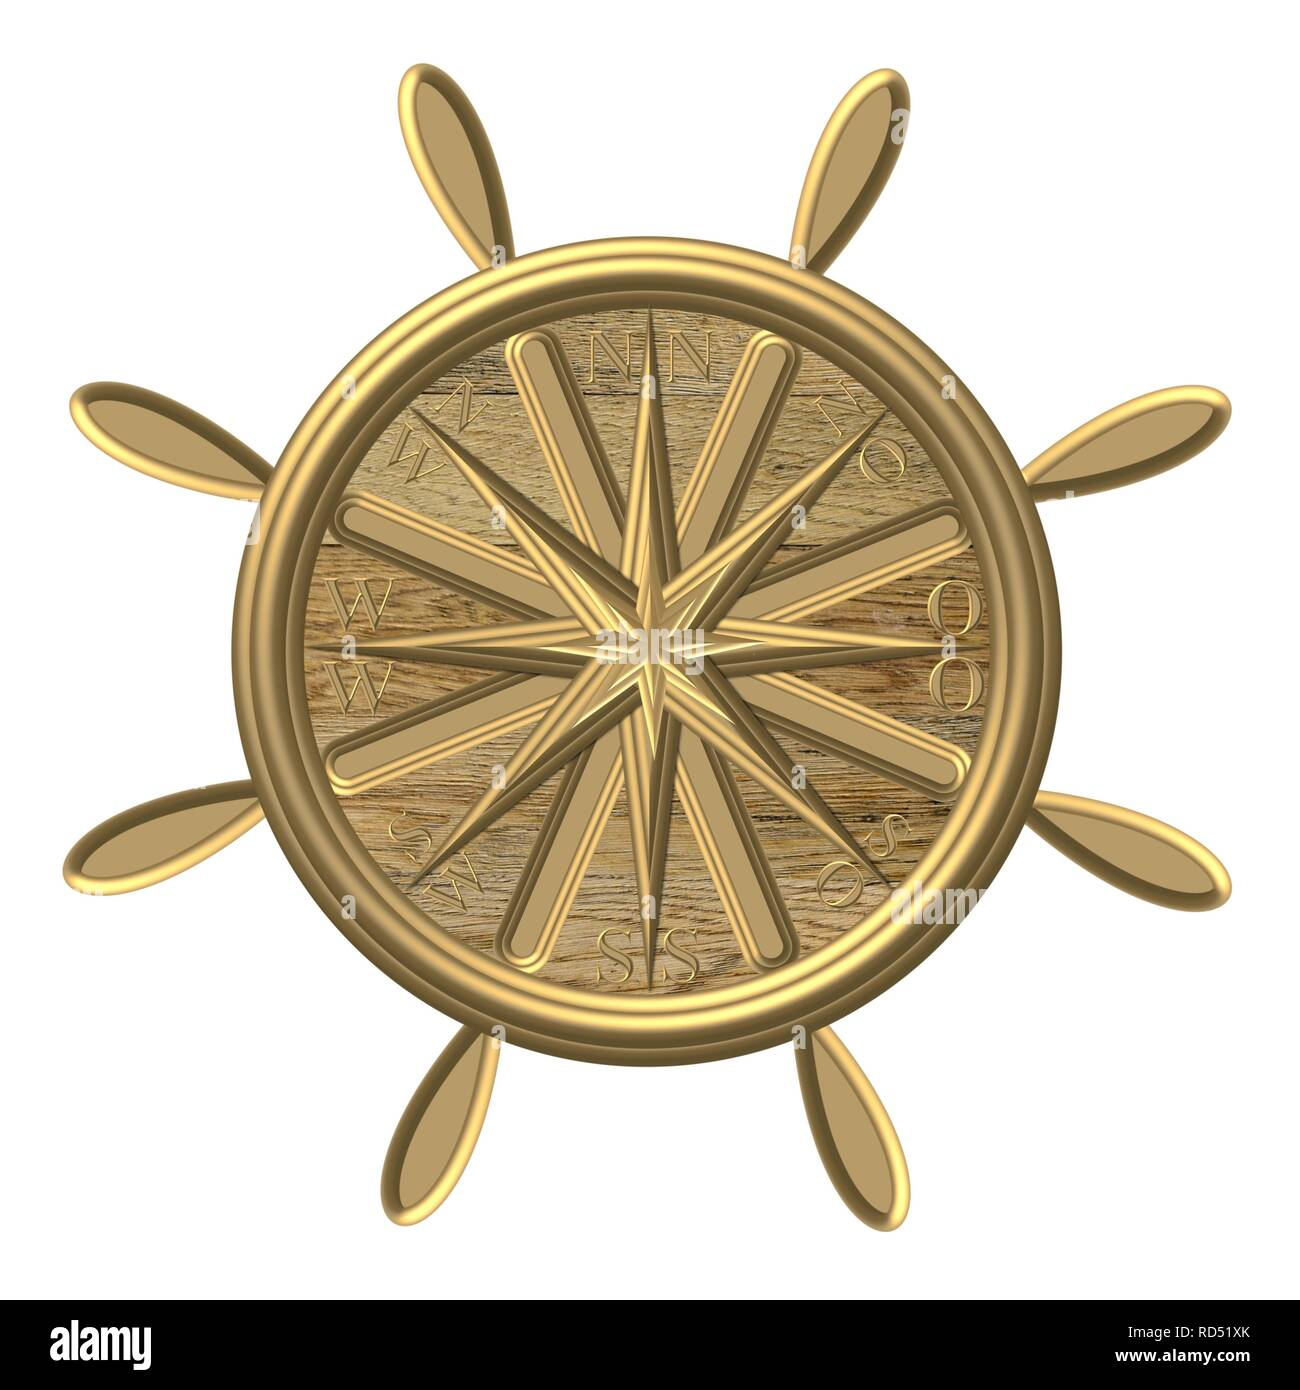 Goldener Kompass – Windrose - Steuerrad - Stock Image